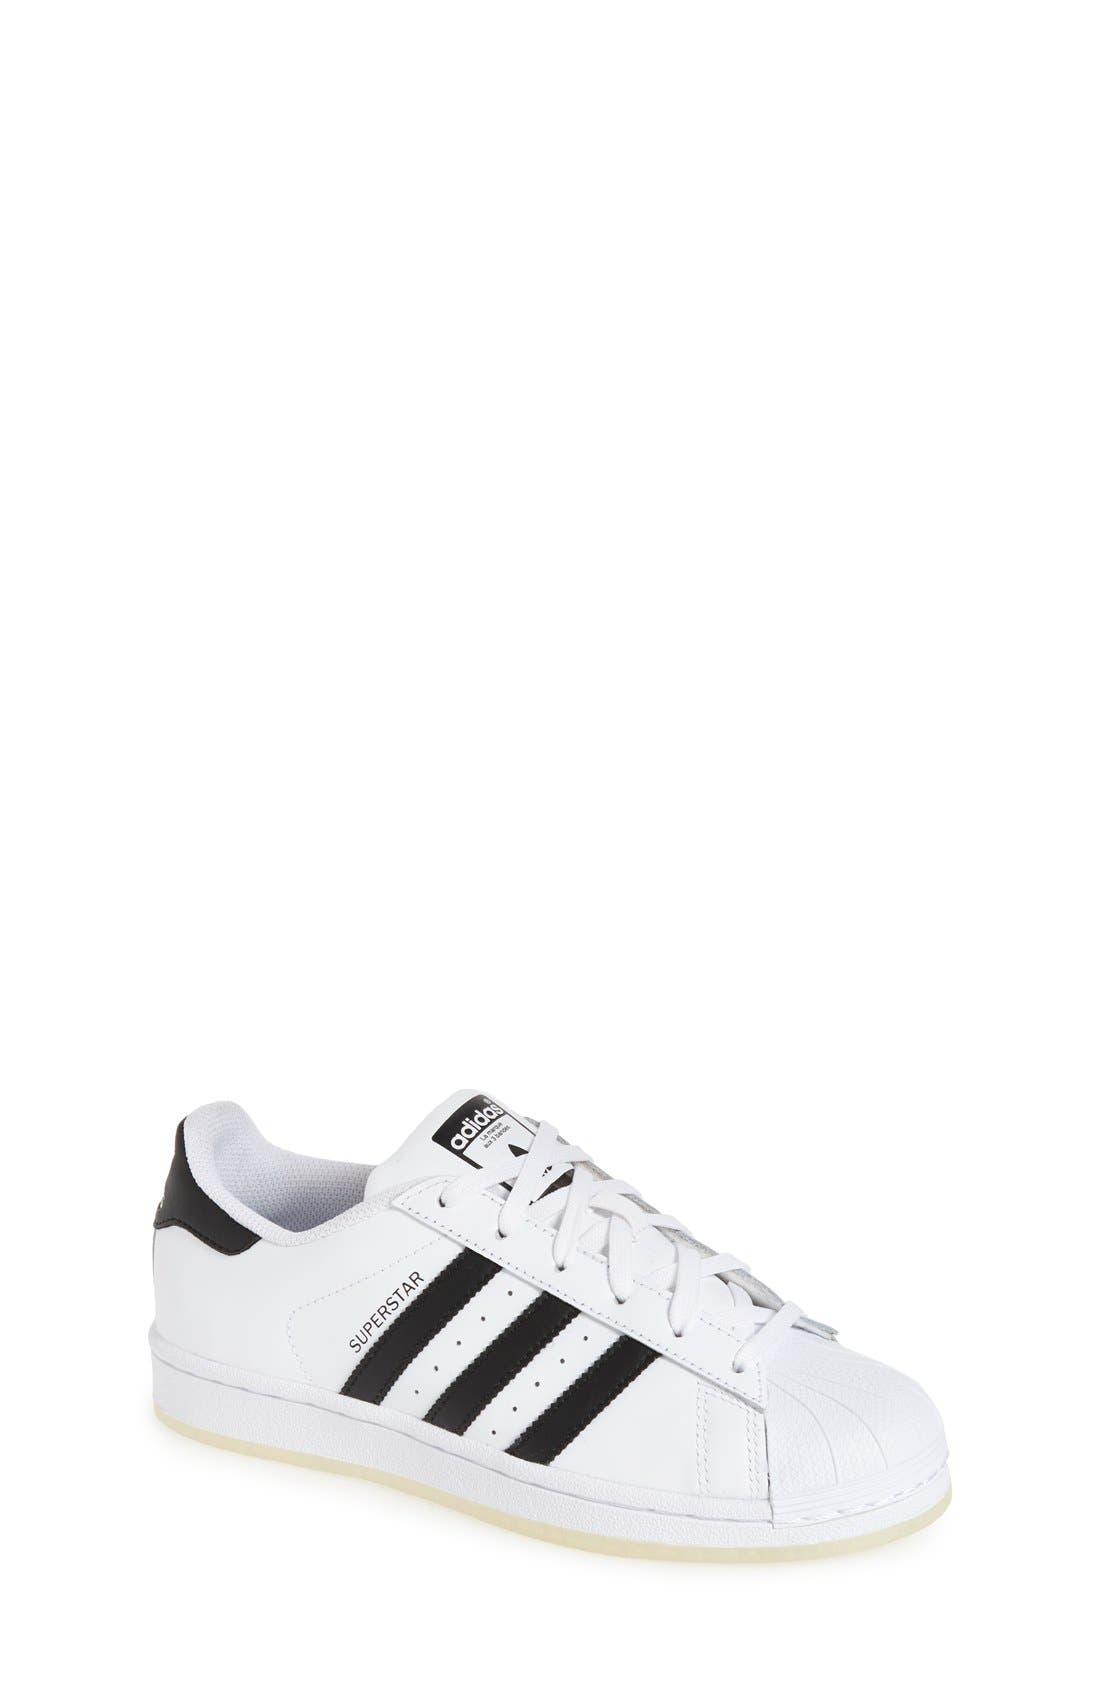 Alternate Image 1 Selected - adidas Superstar Ice Sneaker (Big Kid)